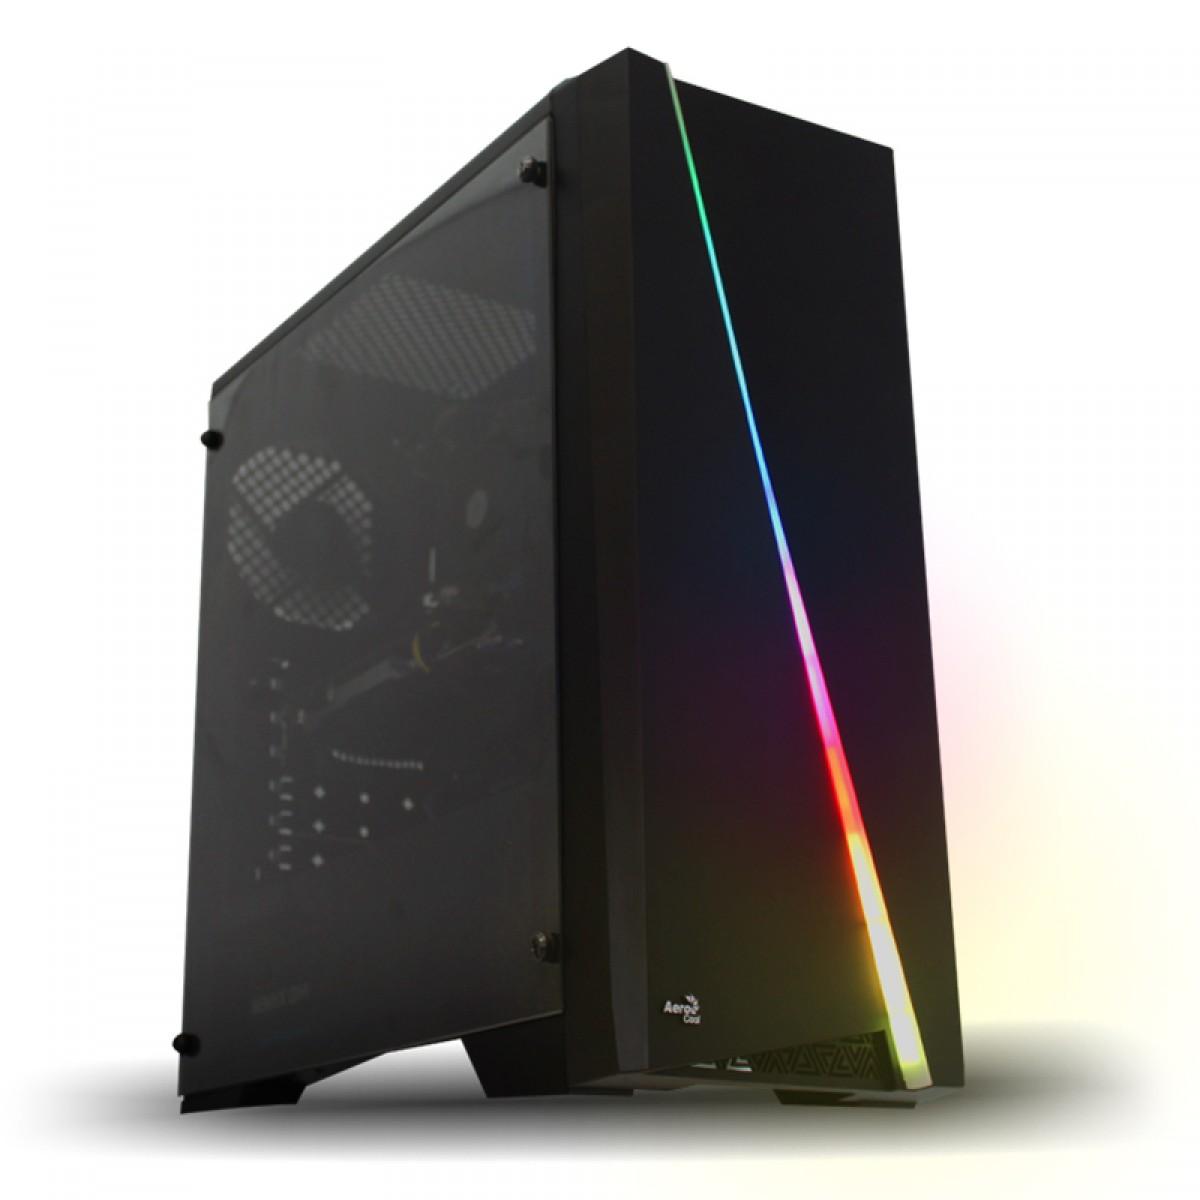 Pc Gamer T-Power Super Warlord Lvl-3 AMD Ryzen 7 3700X / Geforce RTX 2060 6GB / DDR4 16GB / HD 1TB / 600W / RZ3